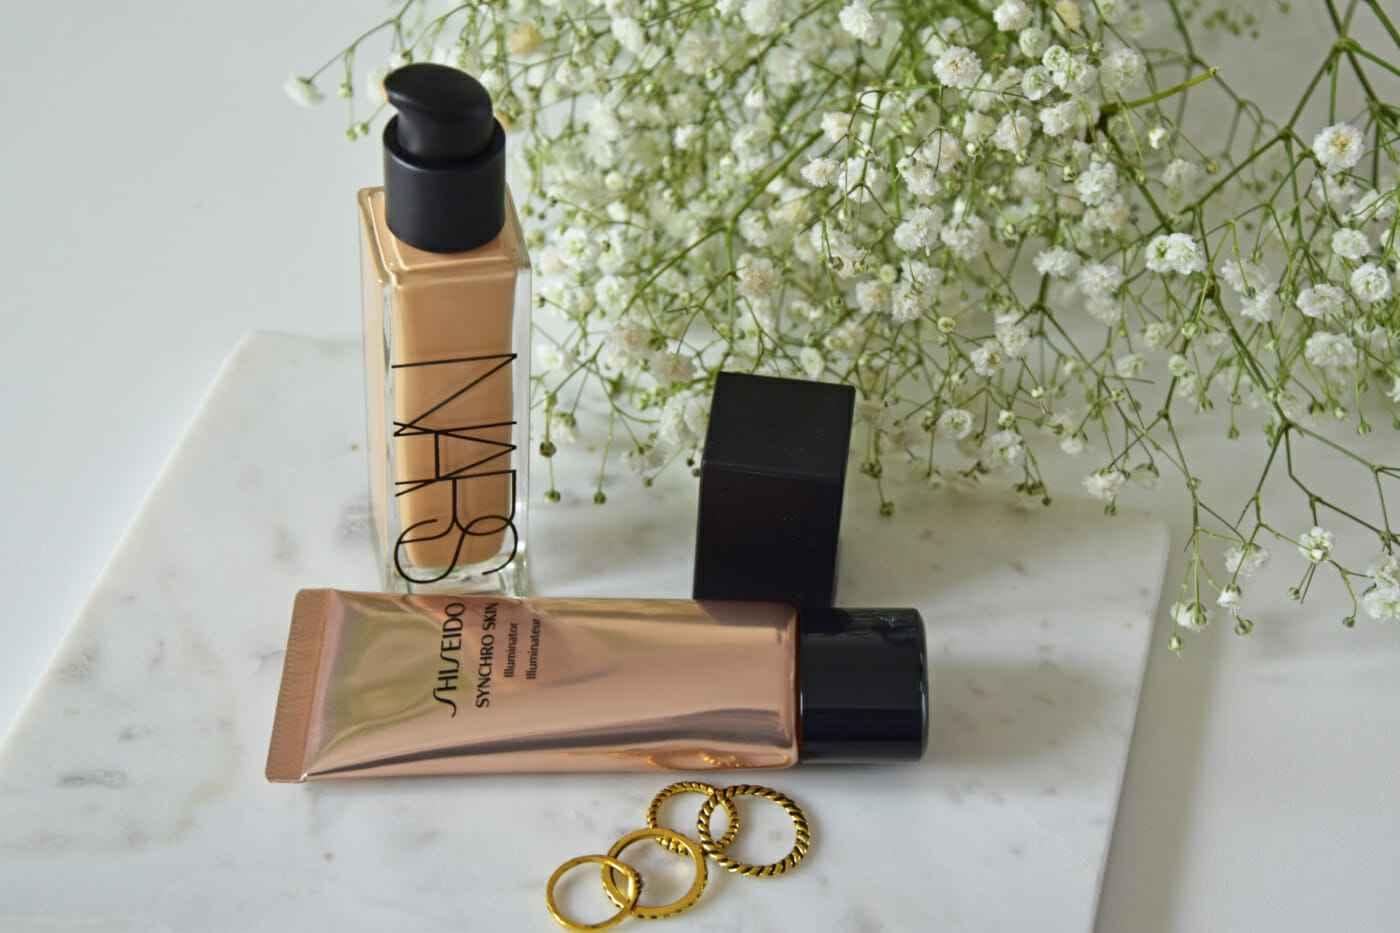 NARS und Shiseido